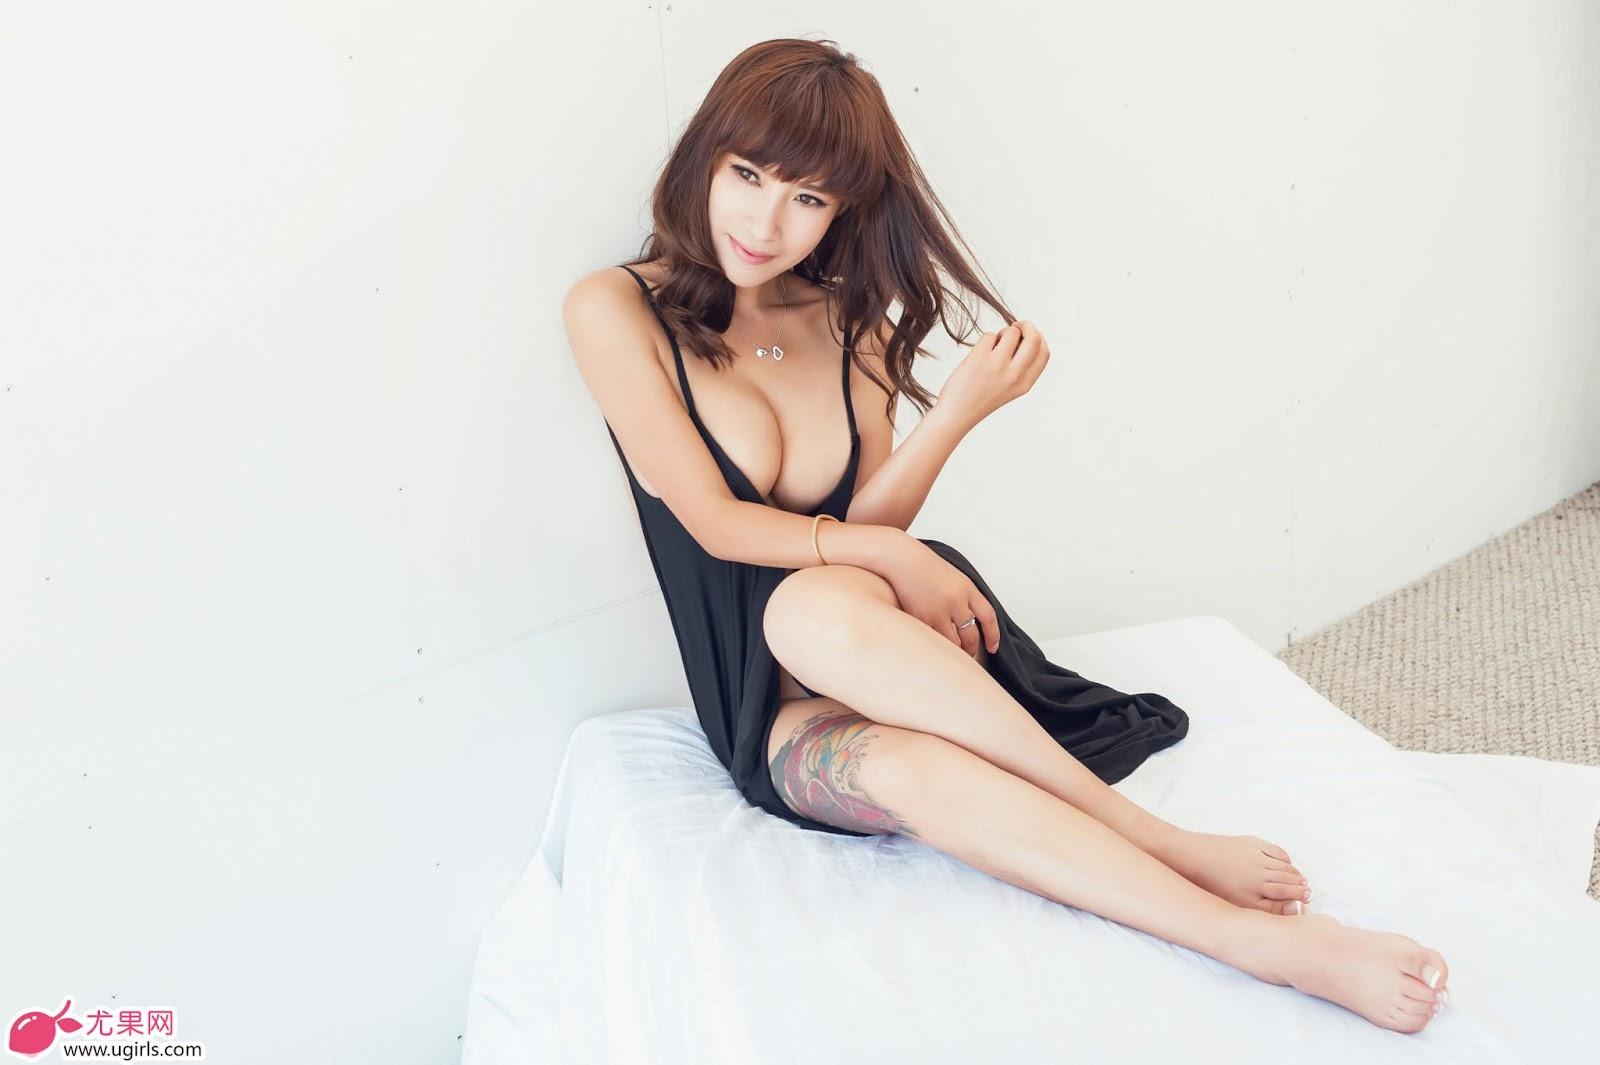 DLS 0161 - Hot Girl Ugirls No.021 Model: 田依依